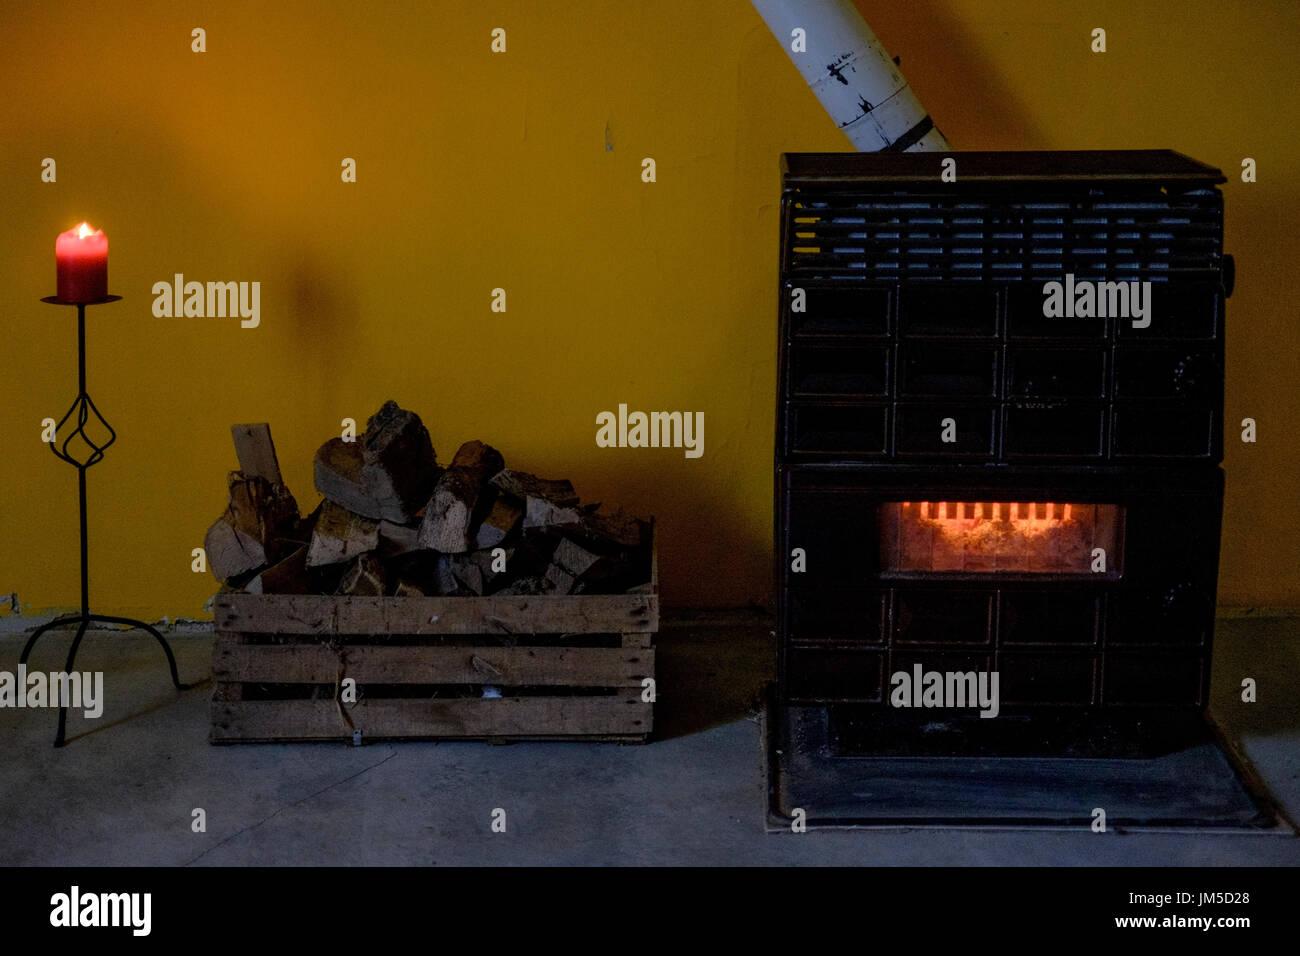 room wood burner burning stock photos u0026 room wood burner burning